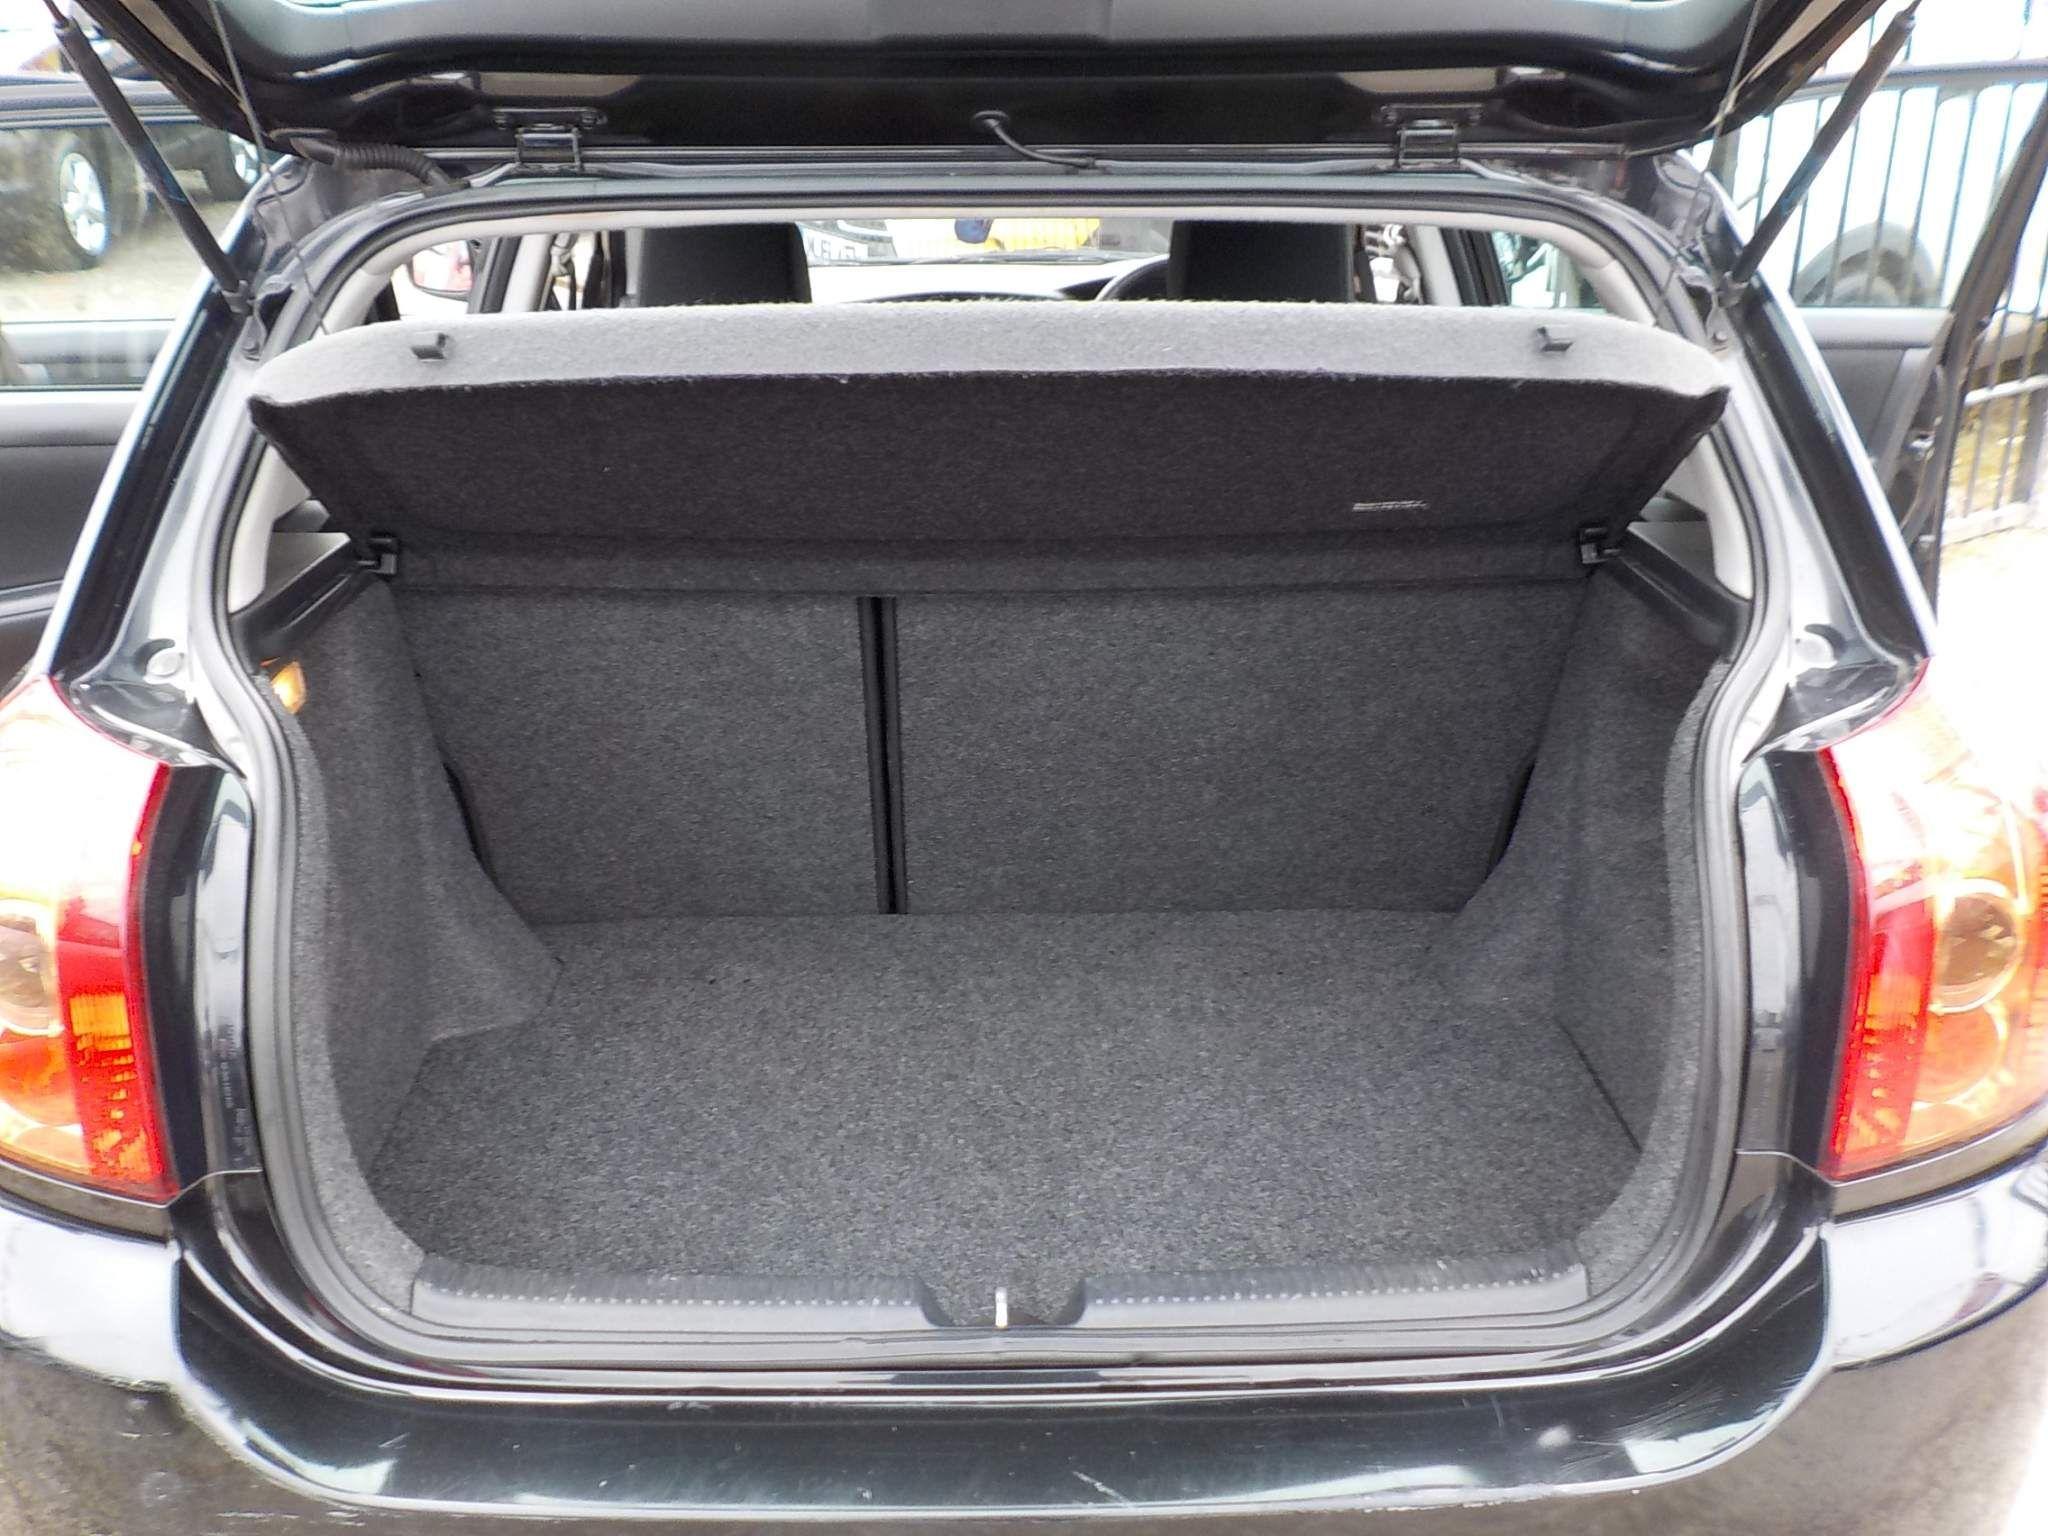 Toyota Corolla 1.4 VVT-i T3 5dr